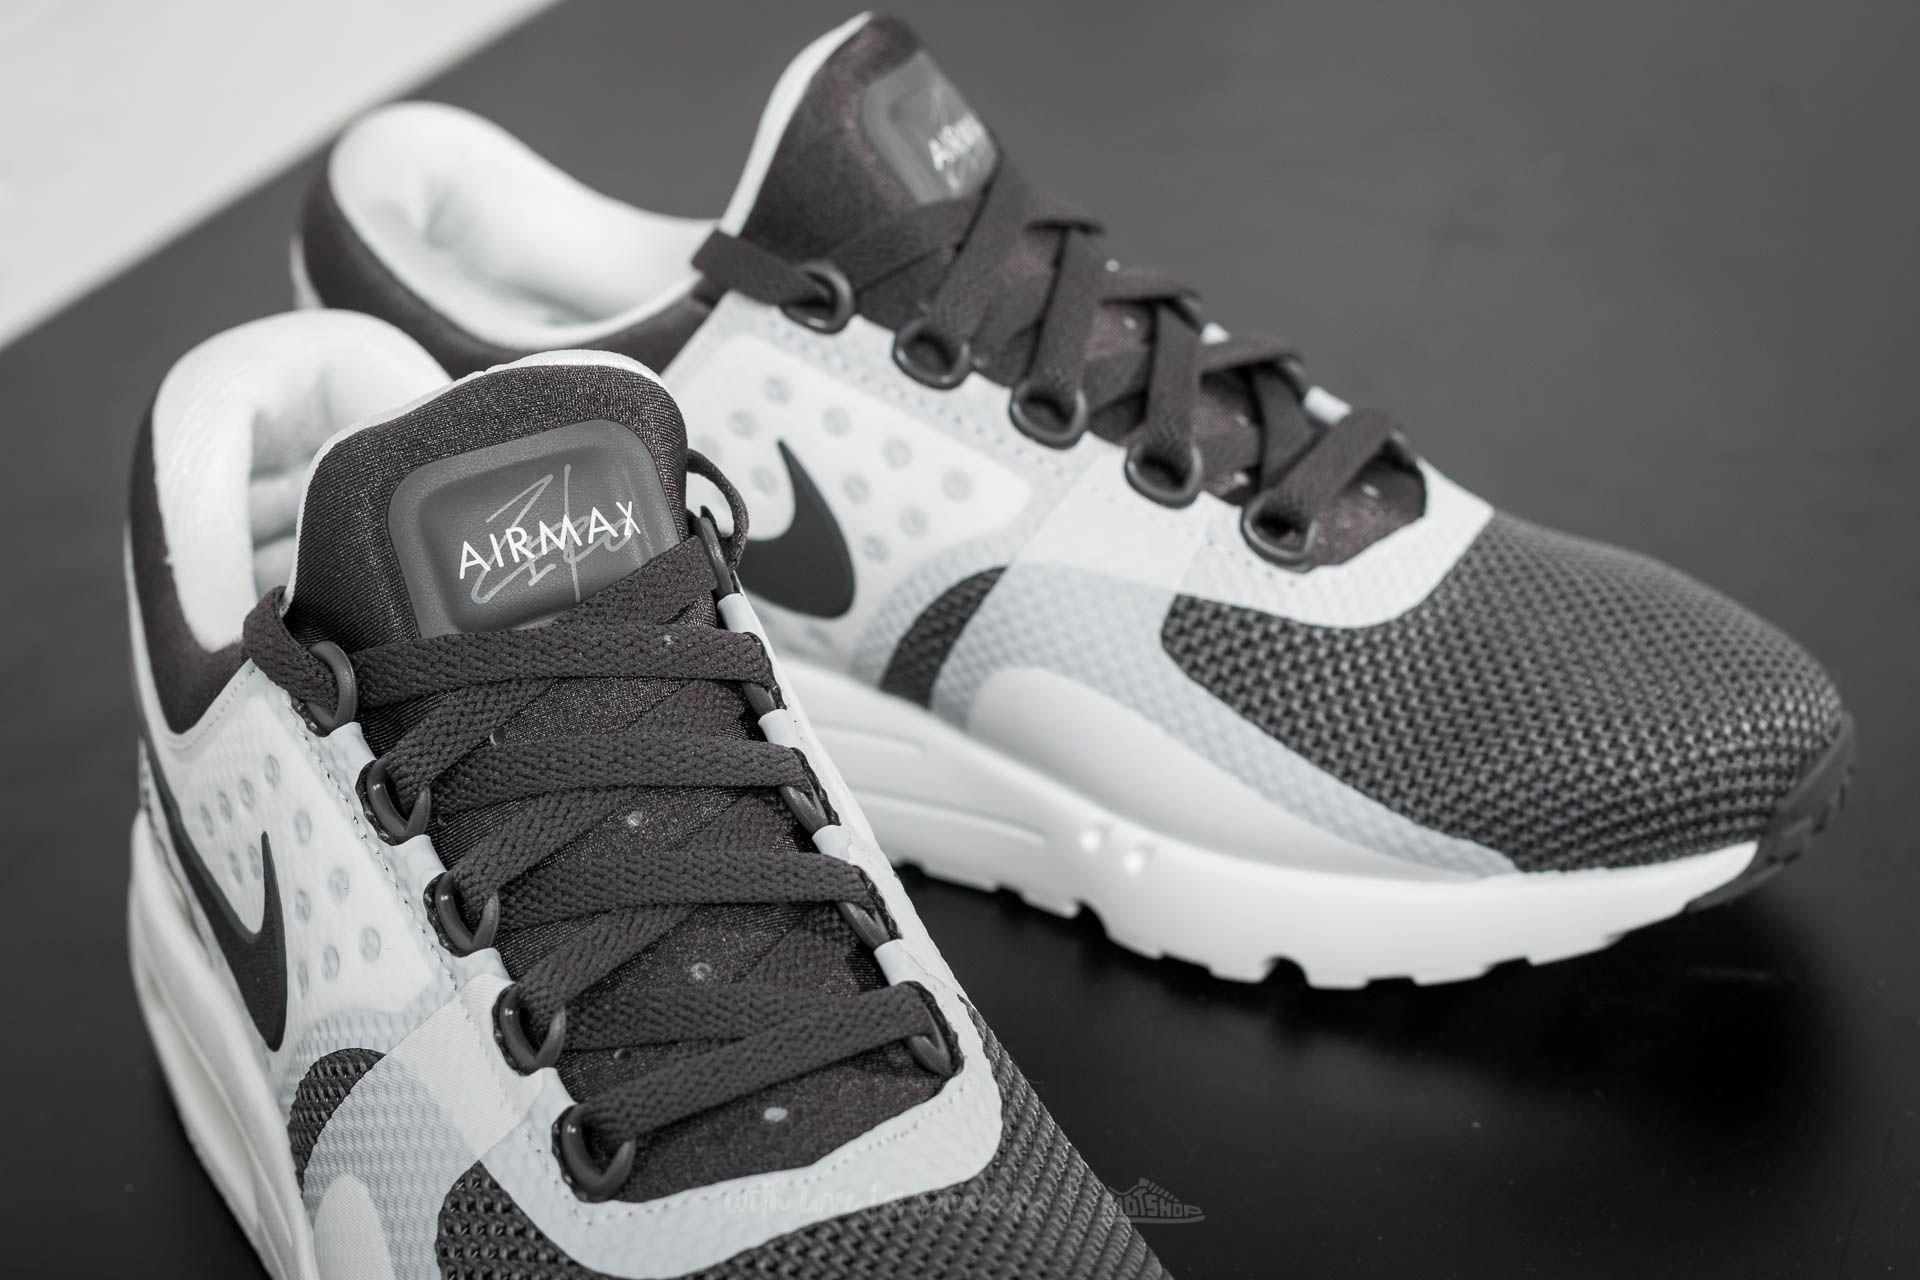 Nike Air Max Zero Essential Men's Shoe With Midnight Fog